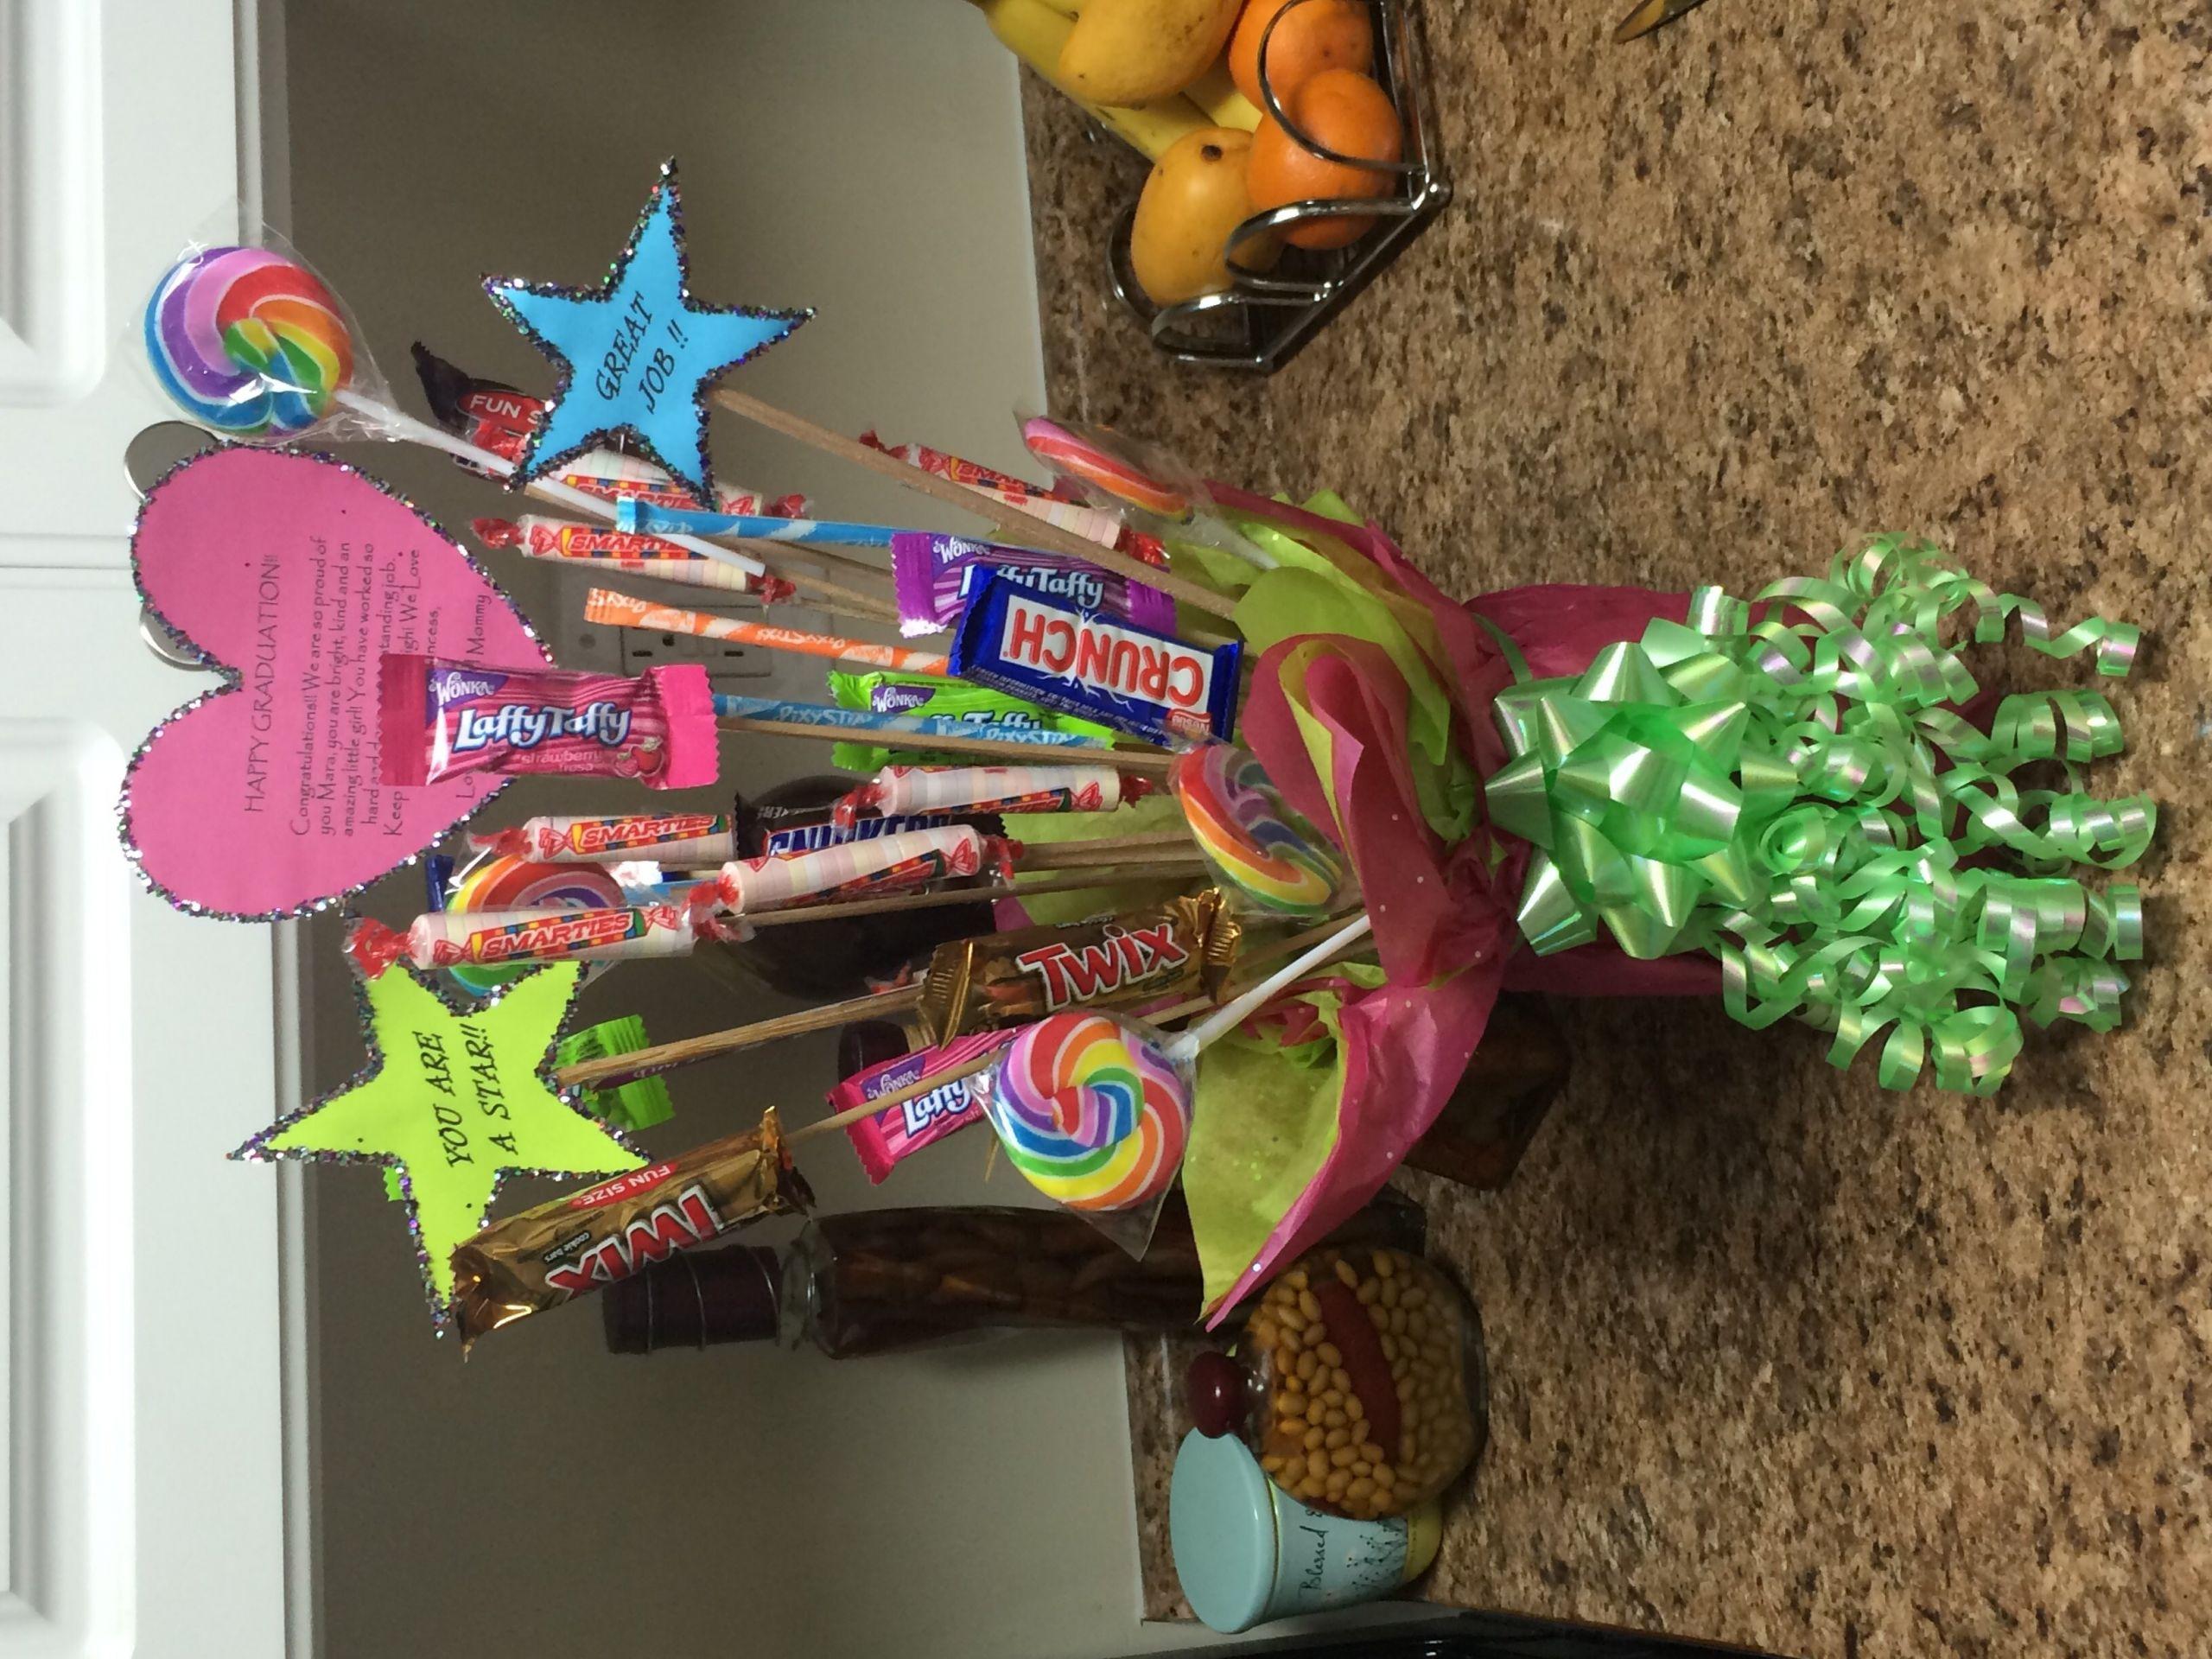 5Th Grade Girl Graduation Gift Ideas  10 Lovable 5Th Grade Graduation Gift Ideas 2019